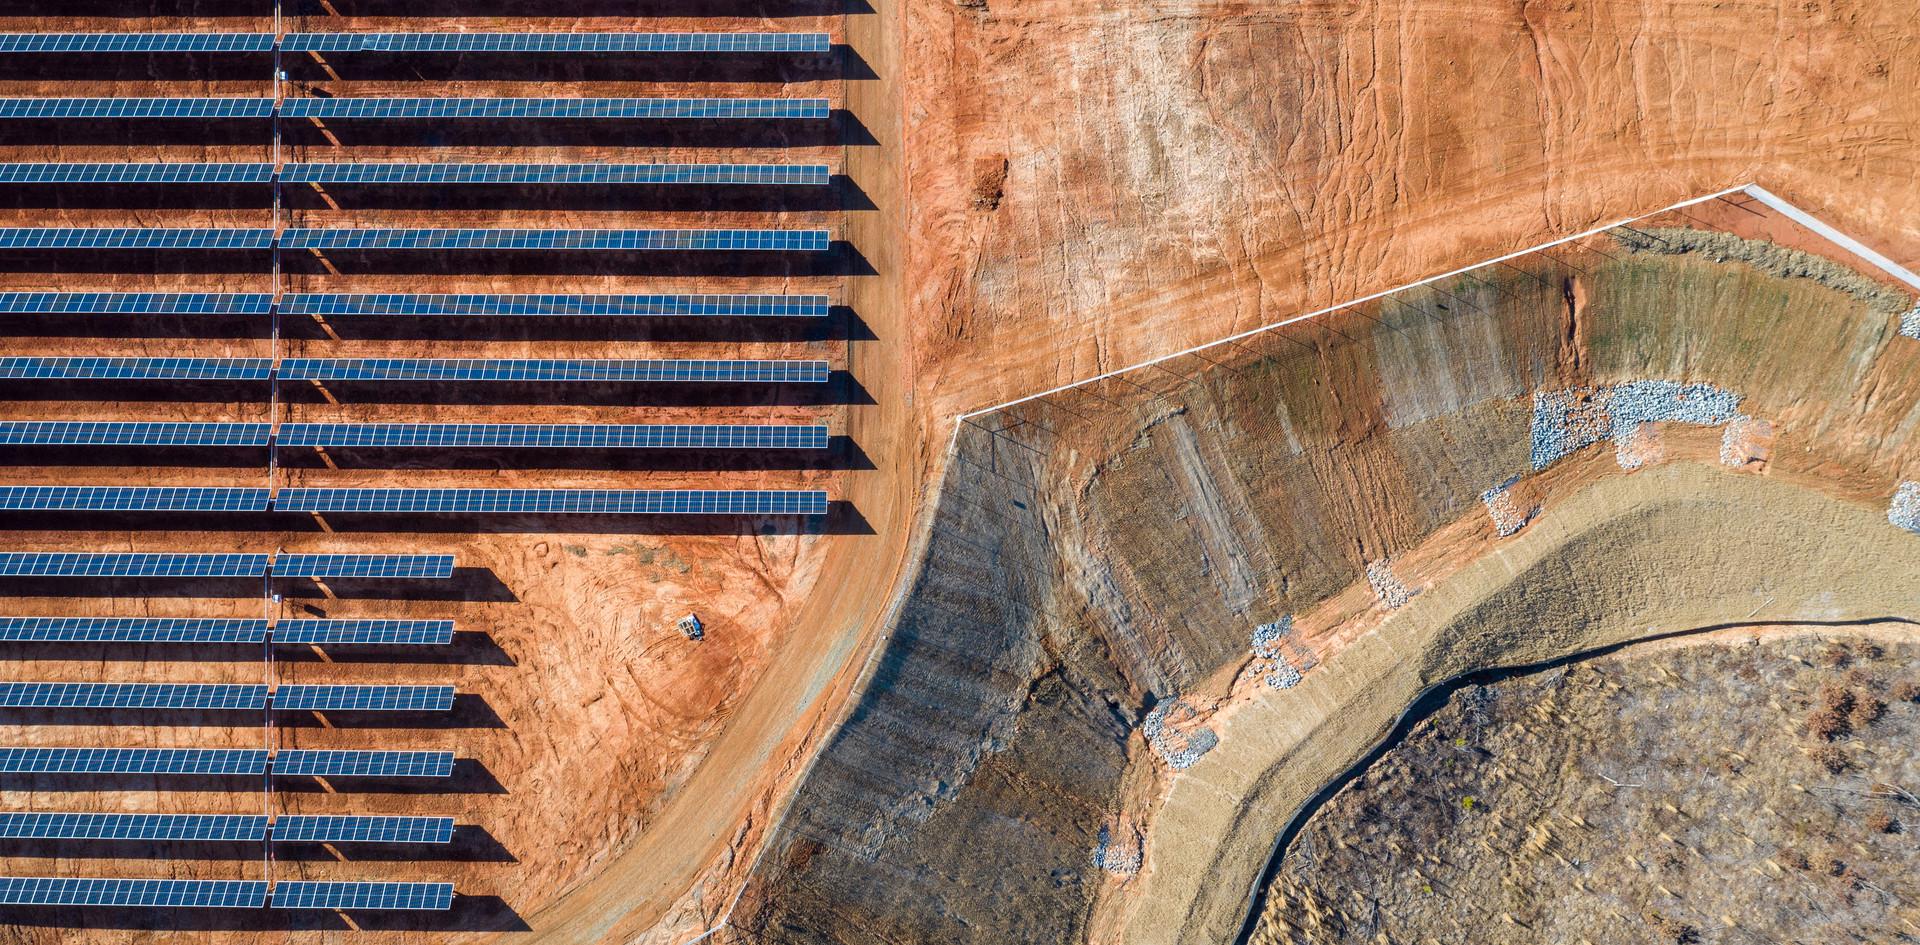 Spotsylvania County, VA - Industrial-scale solar